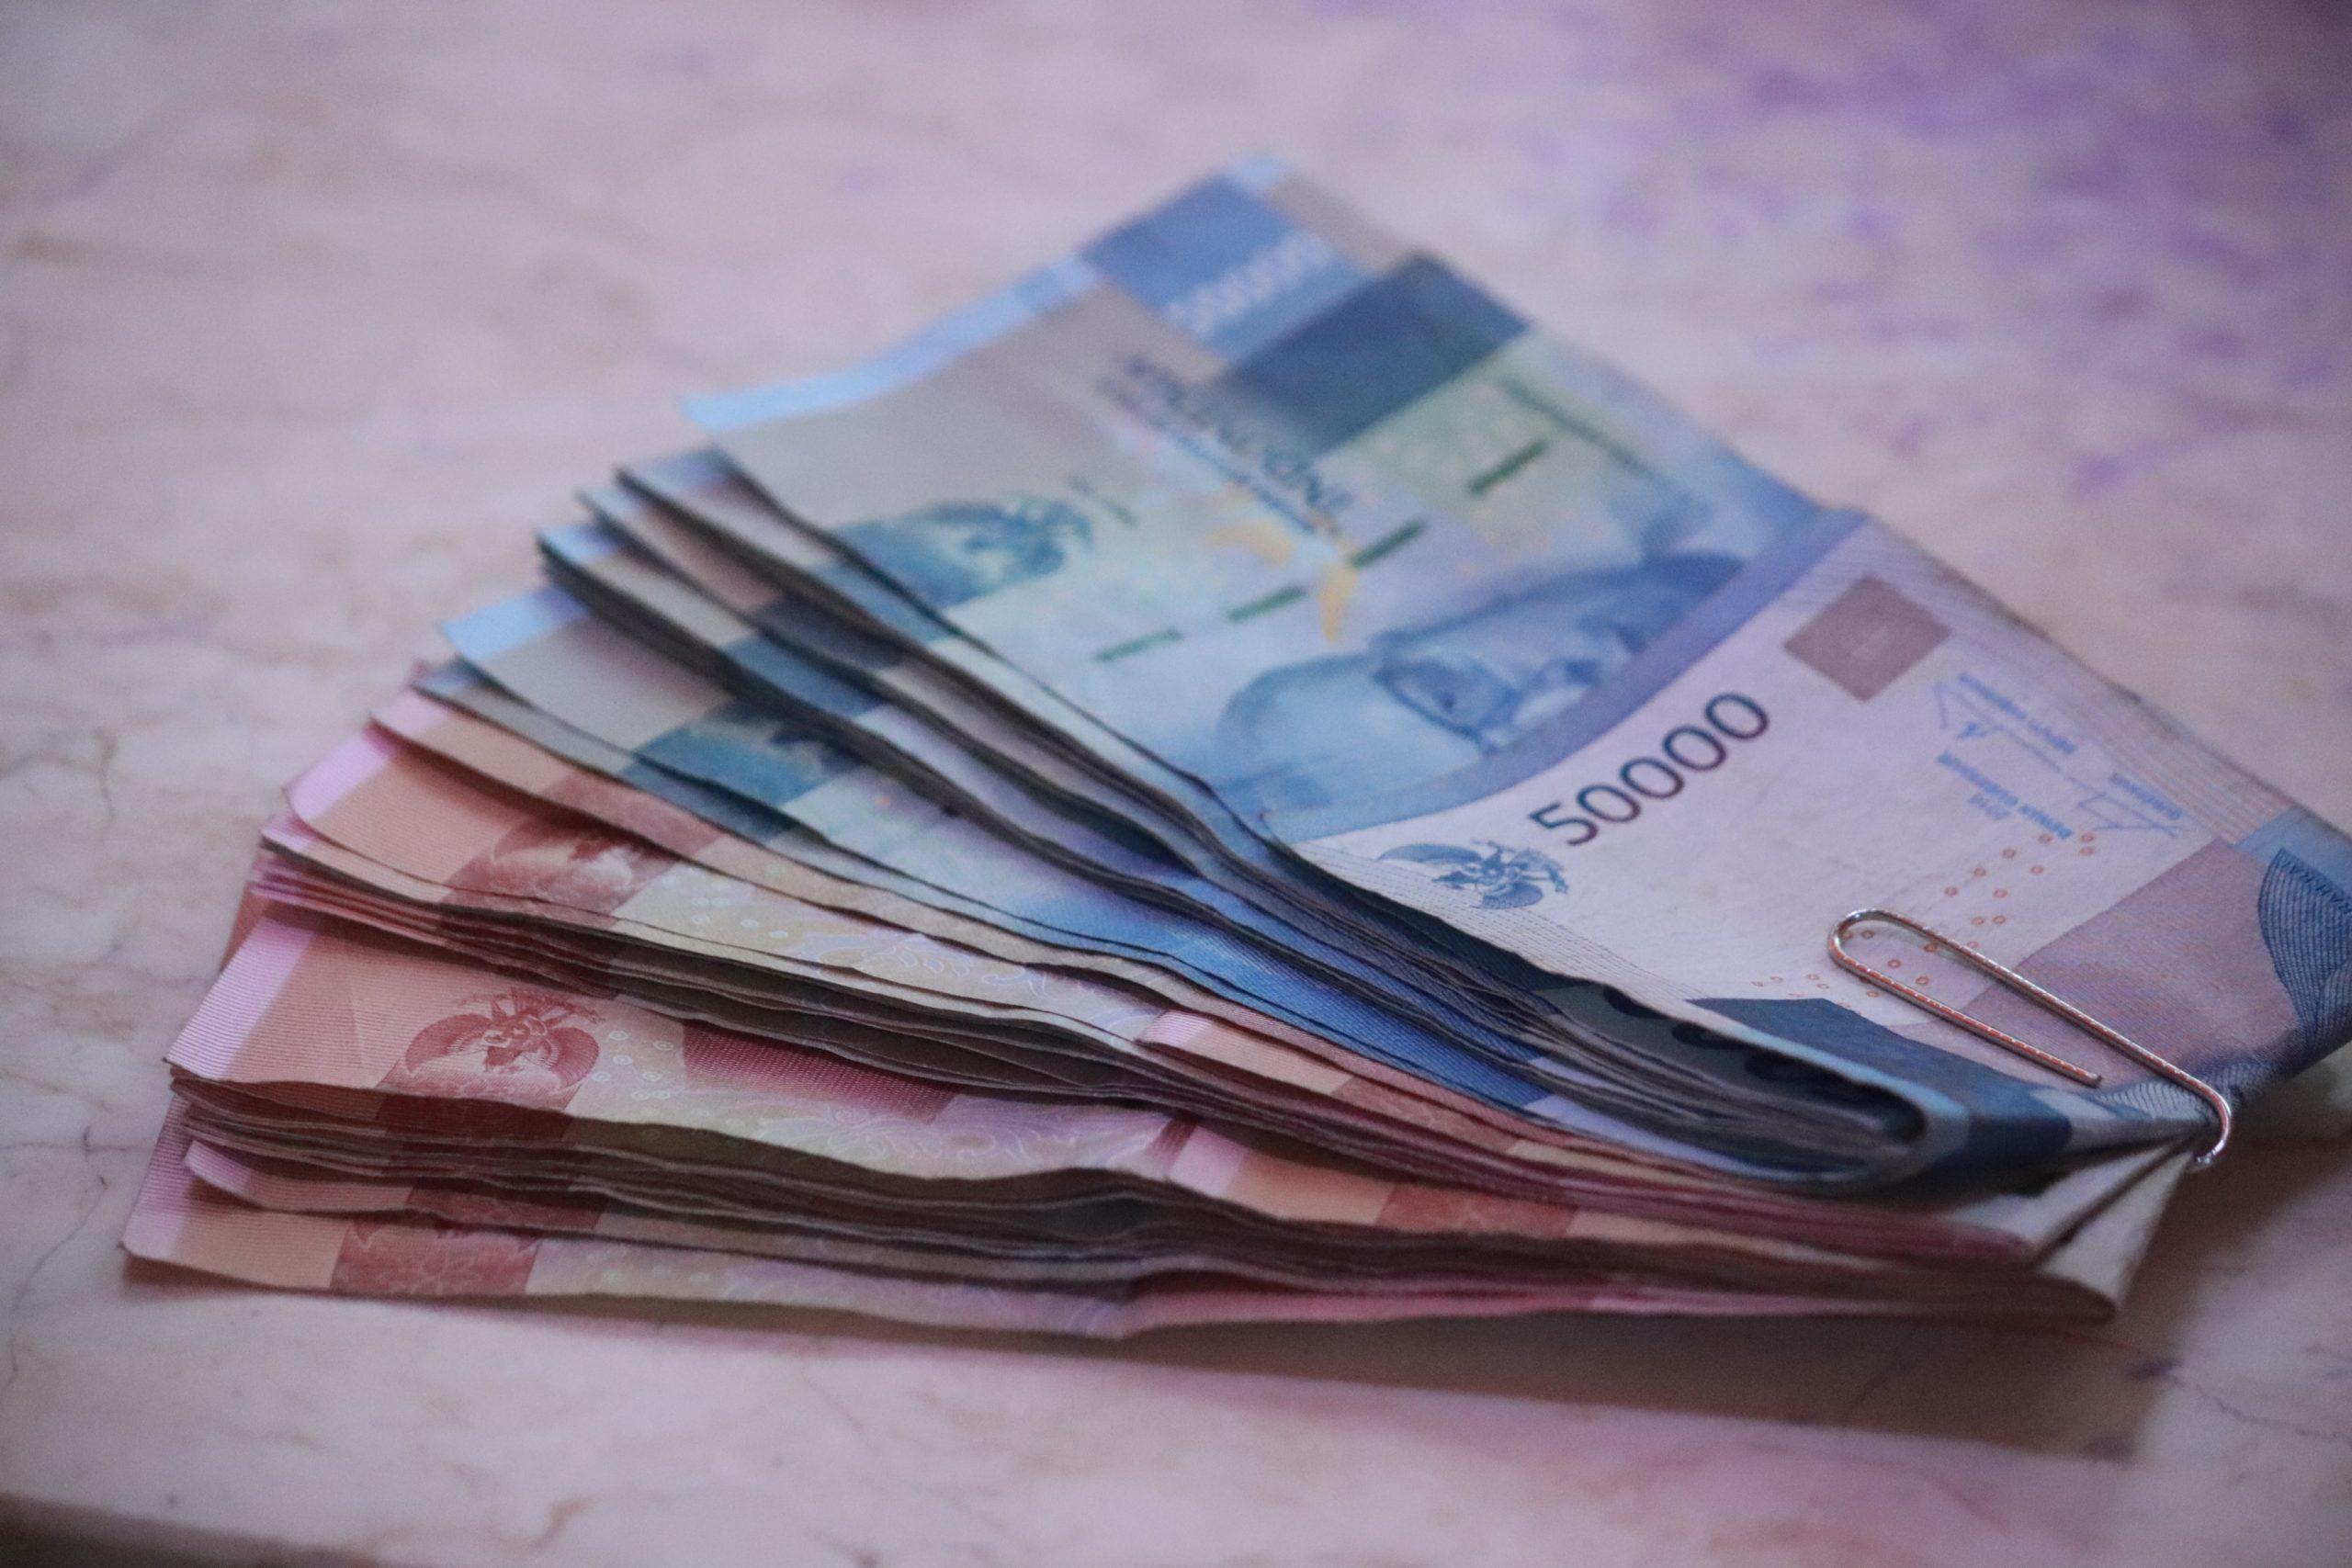 Ingin Hemat, Hindari Pemborosan Pada 3 Aspek Ini!